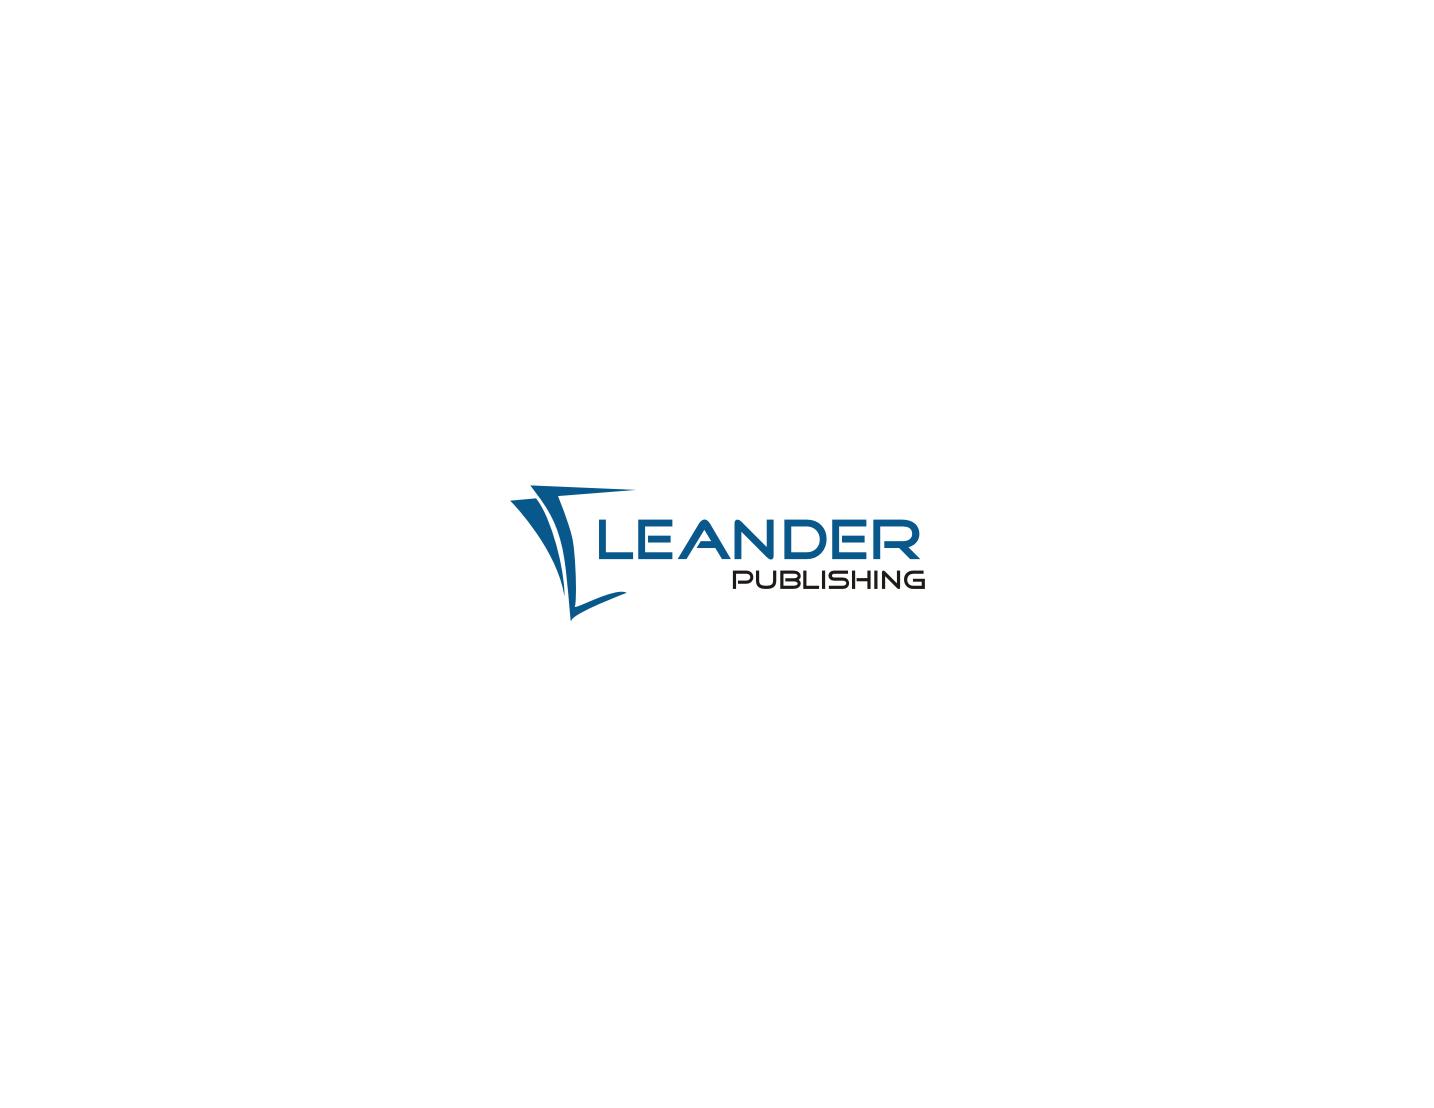 Professional Serious Book Publisher Logo Design For Leander